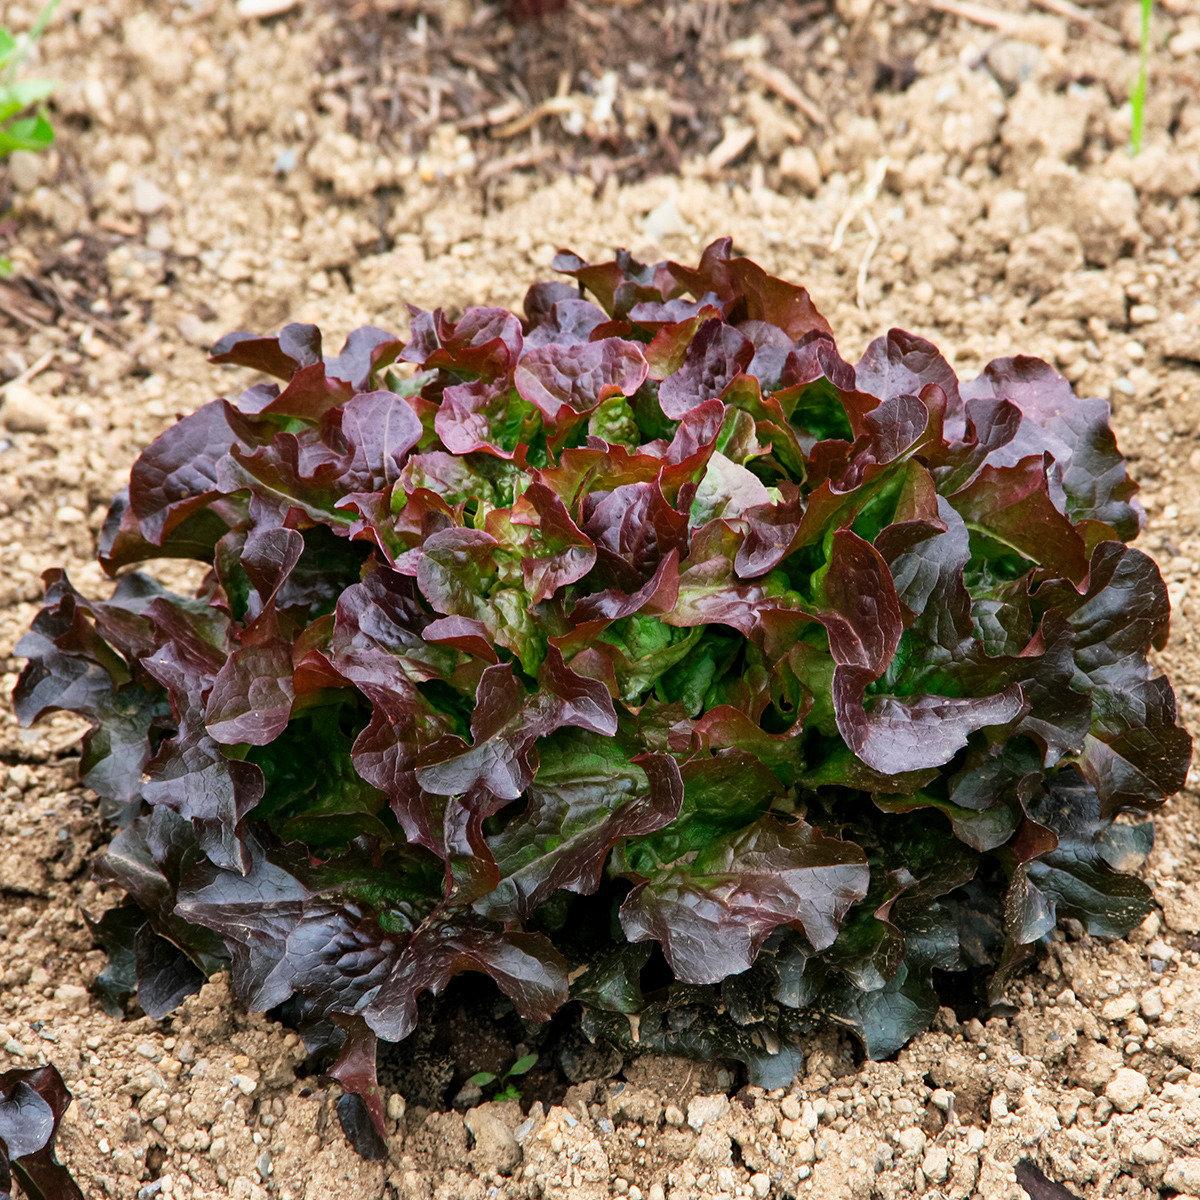 Salatsamen Eichblatt- und Pflücksalat Saxo